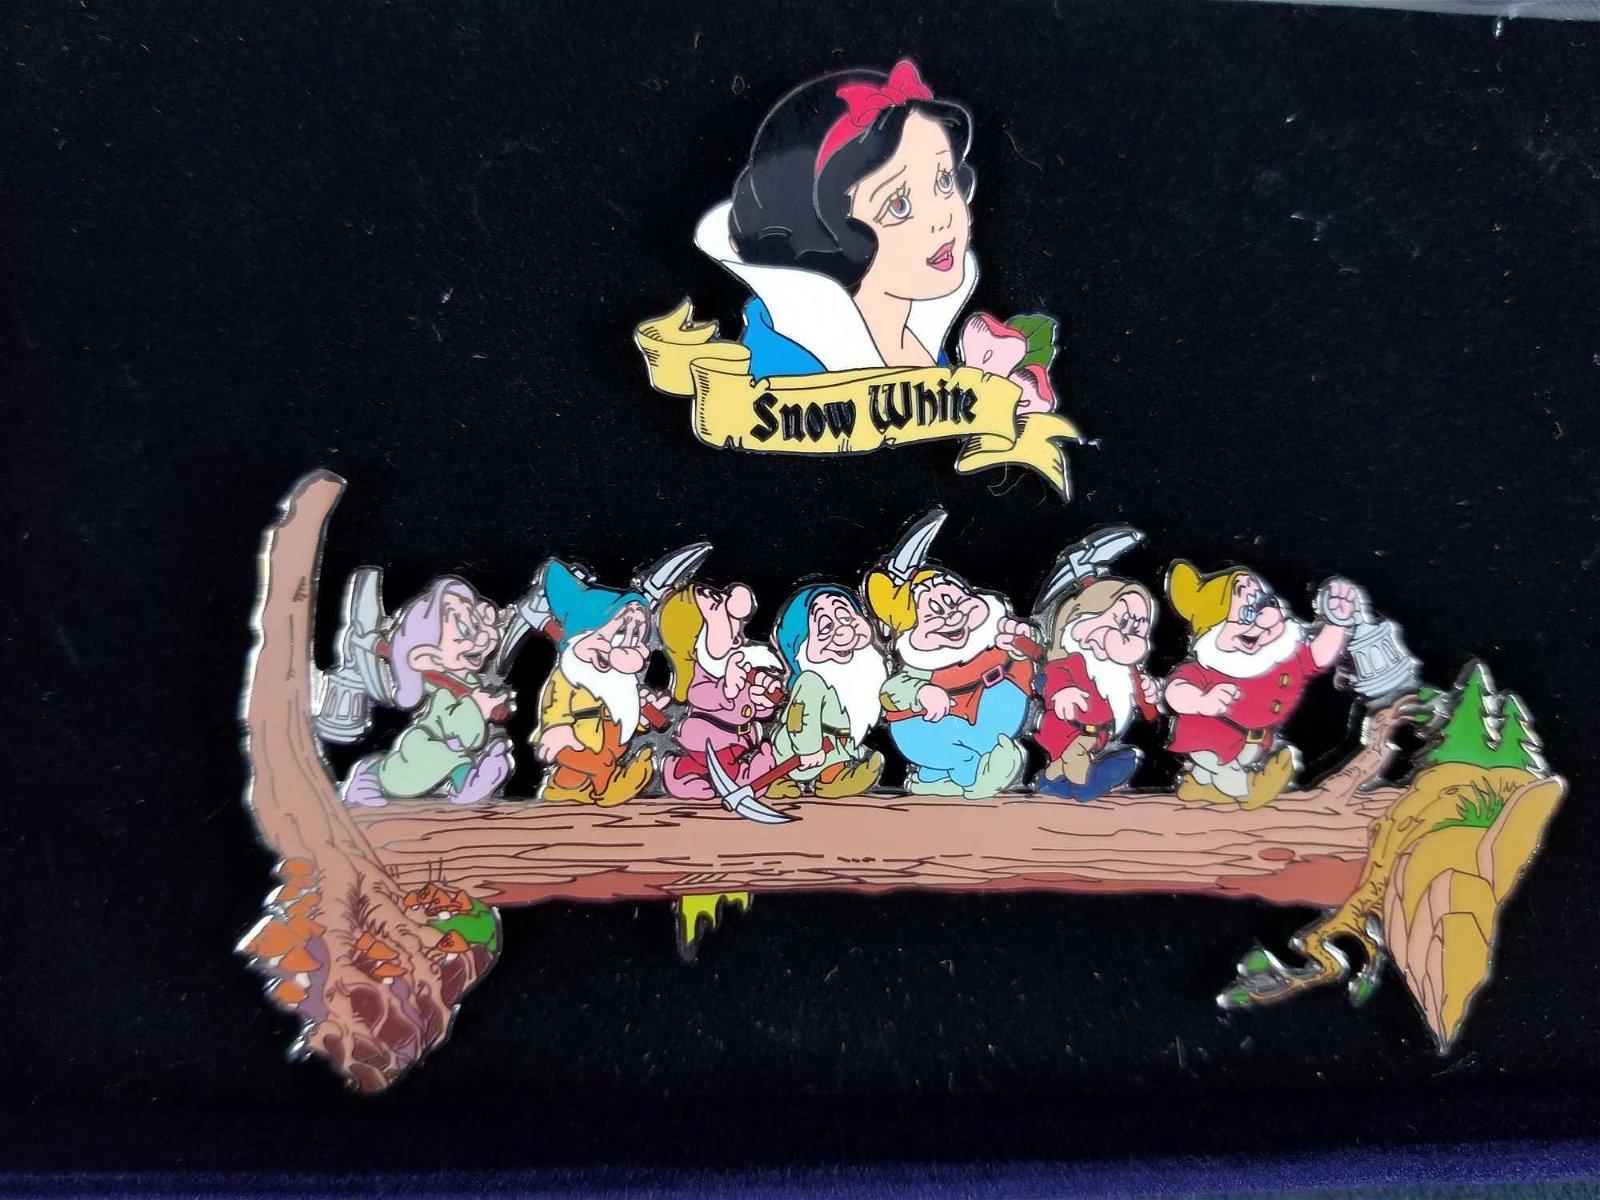 Disney Disneyland Snow White And The Seven Dwarfs Boxed